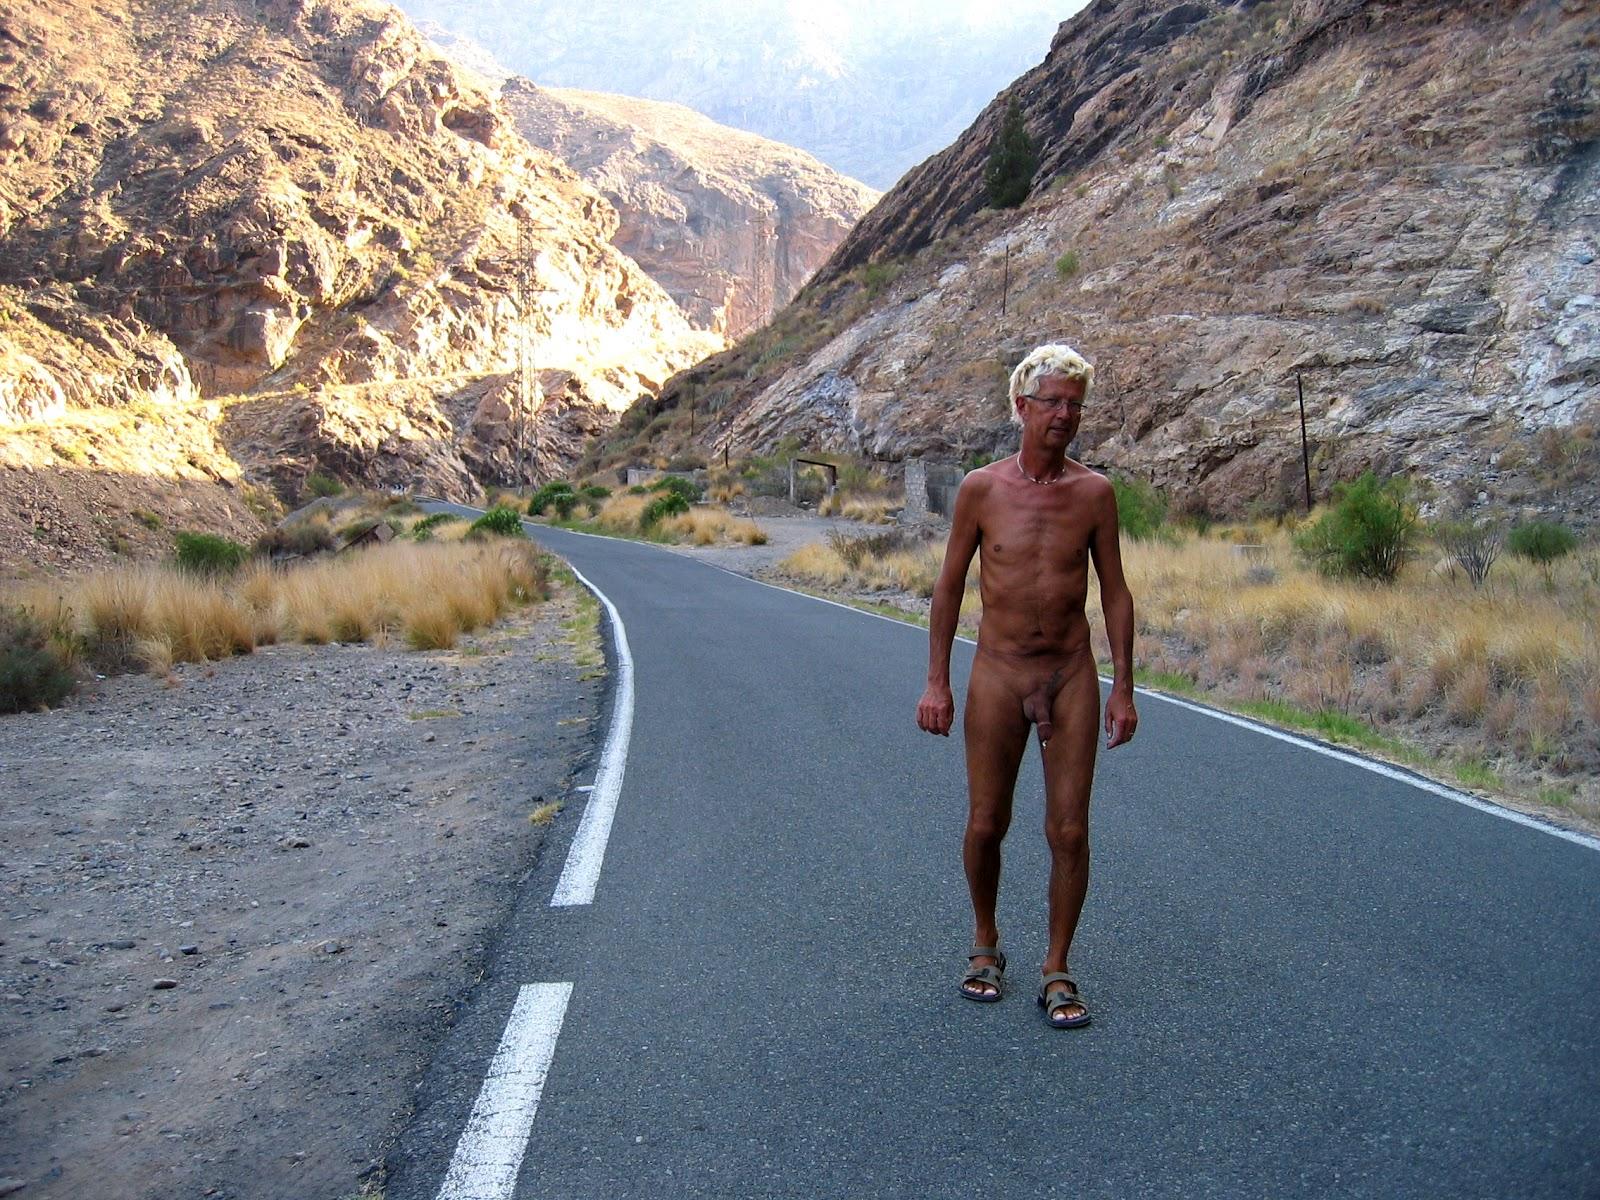 Nude Ordinary People Video 20